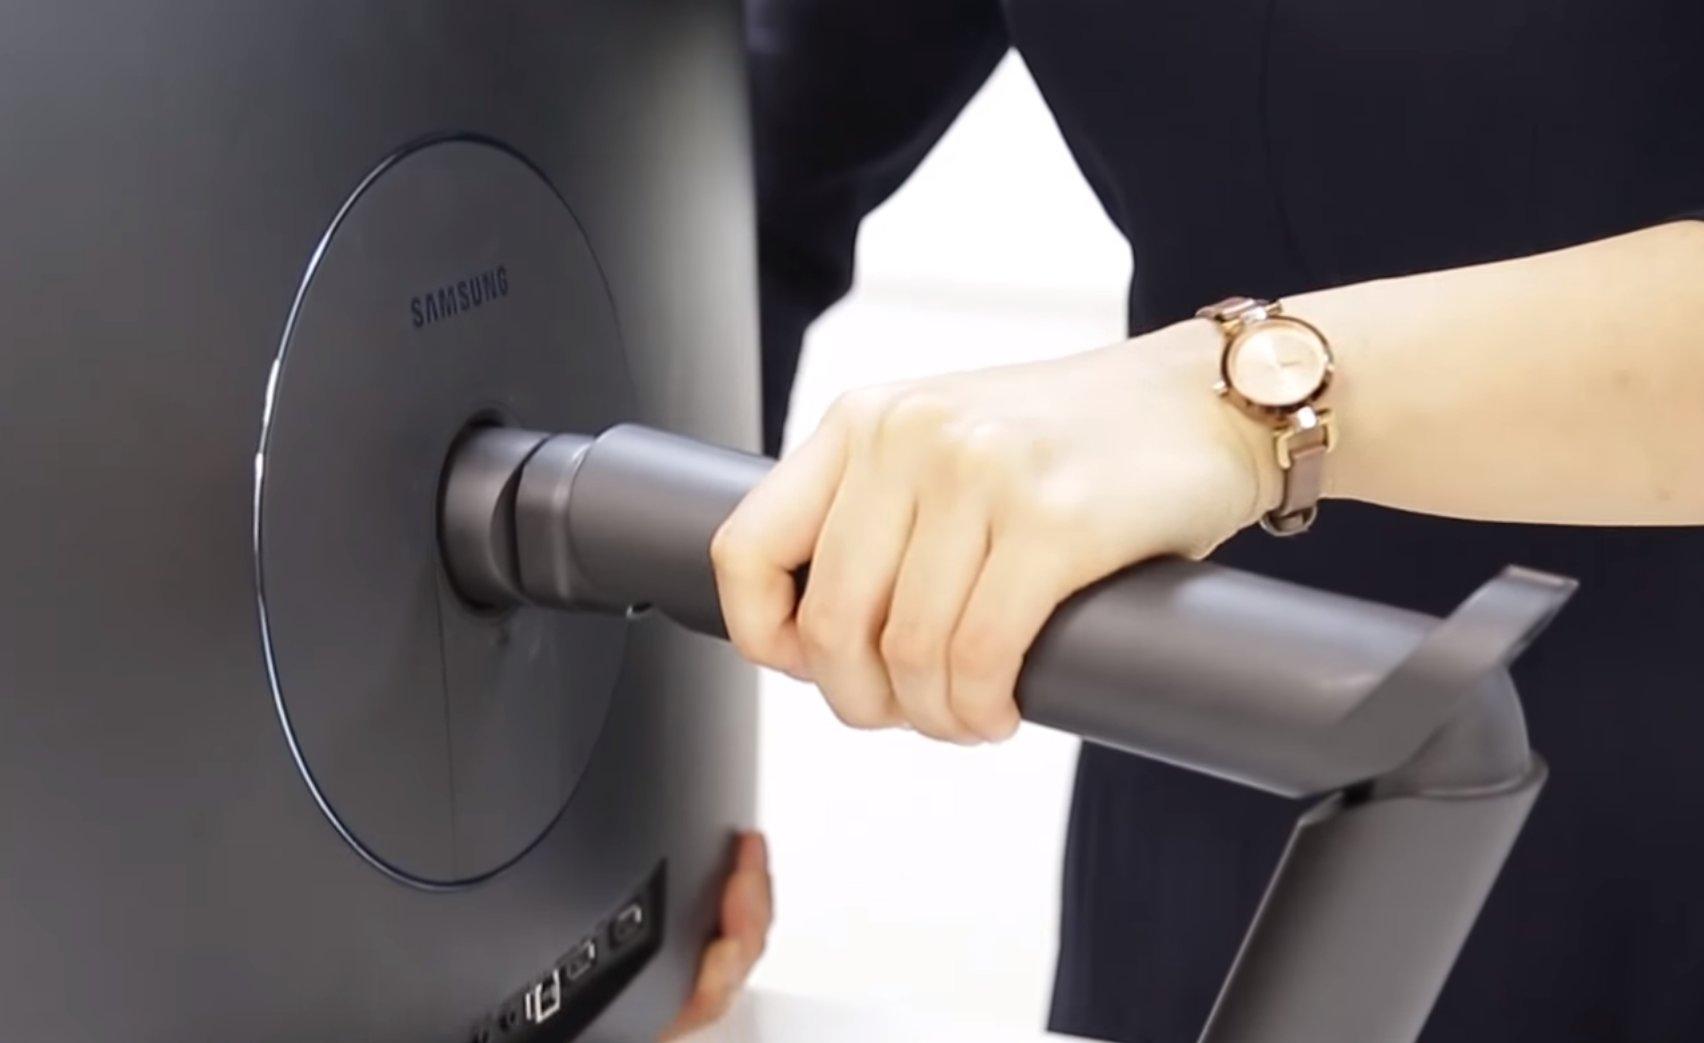 Samsung CFG70: Dual-Hinge Stand